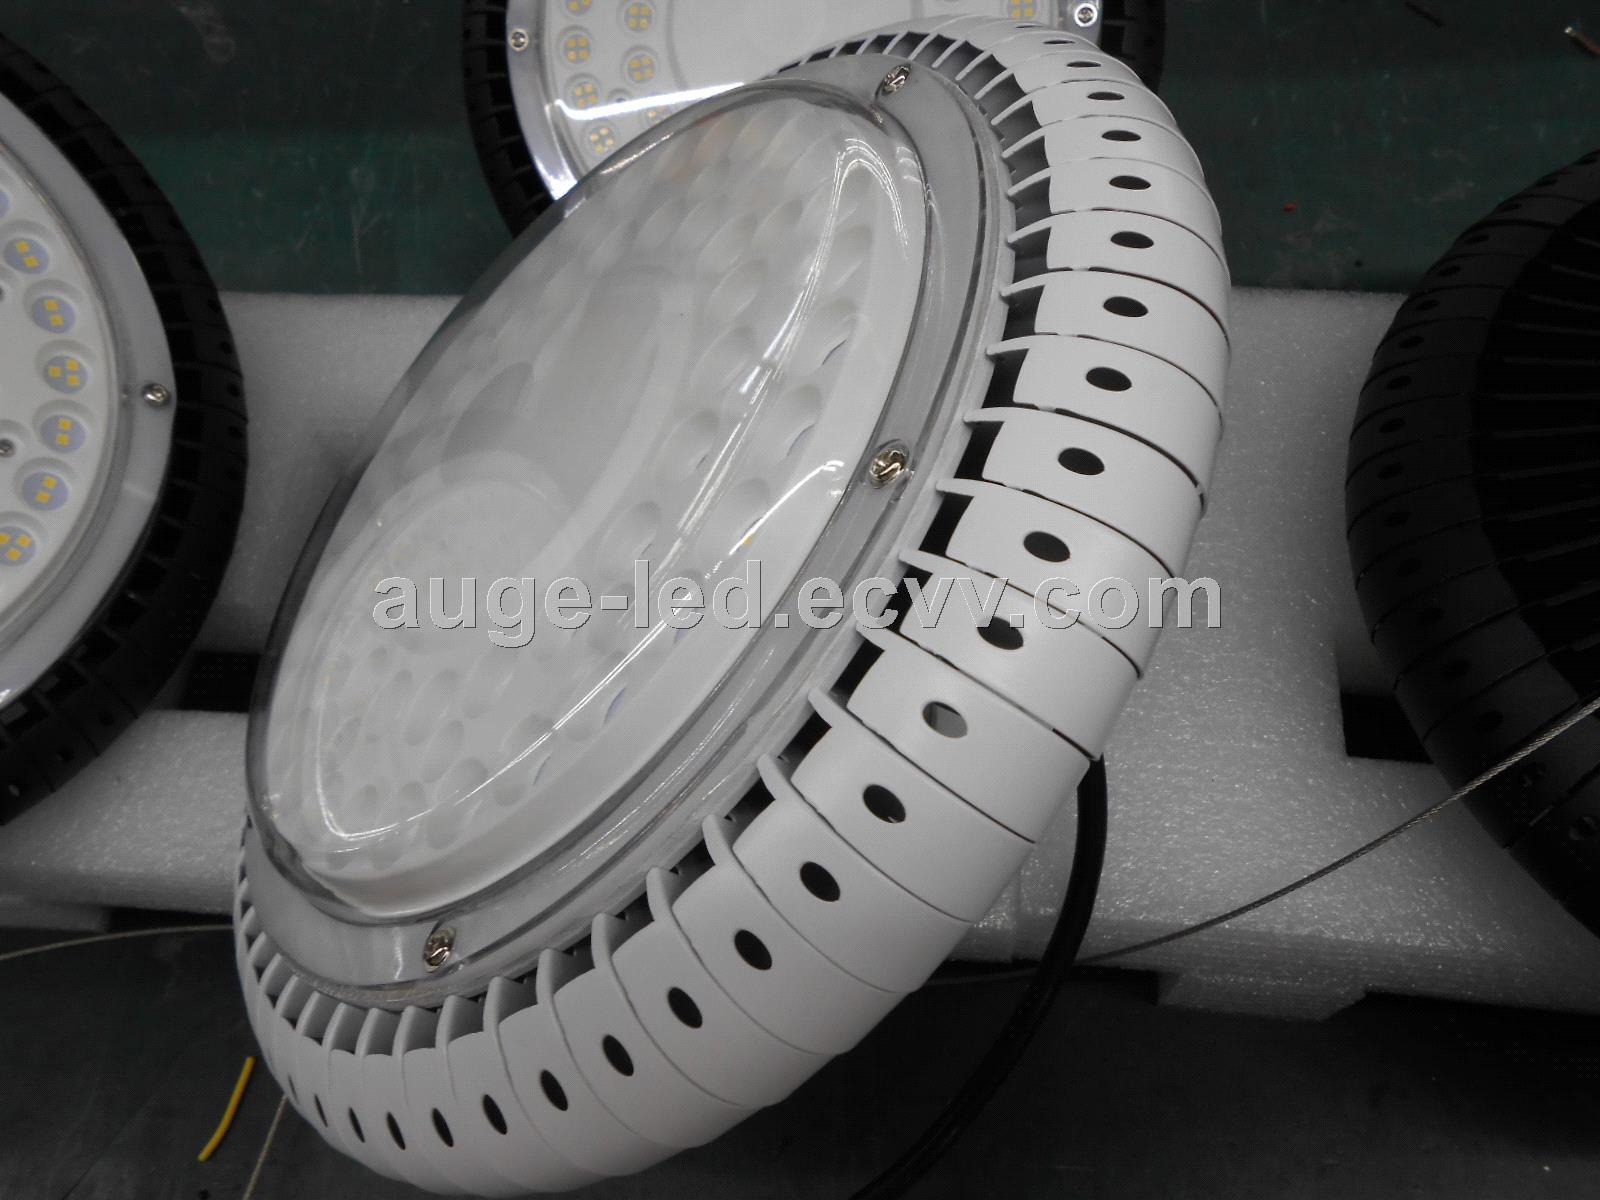 ACE40E39 UFO high bay light 100W 150W DOB high bay light IP65 for warehouse led industrial lighting 100W 150W DOB